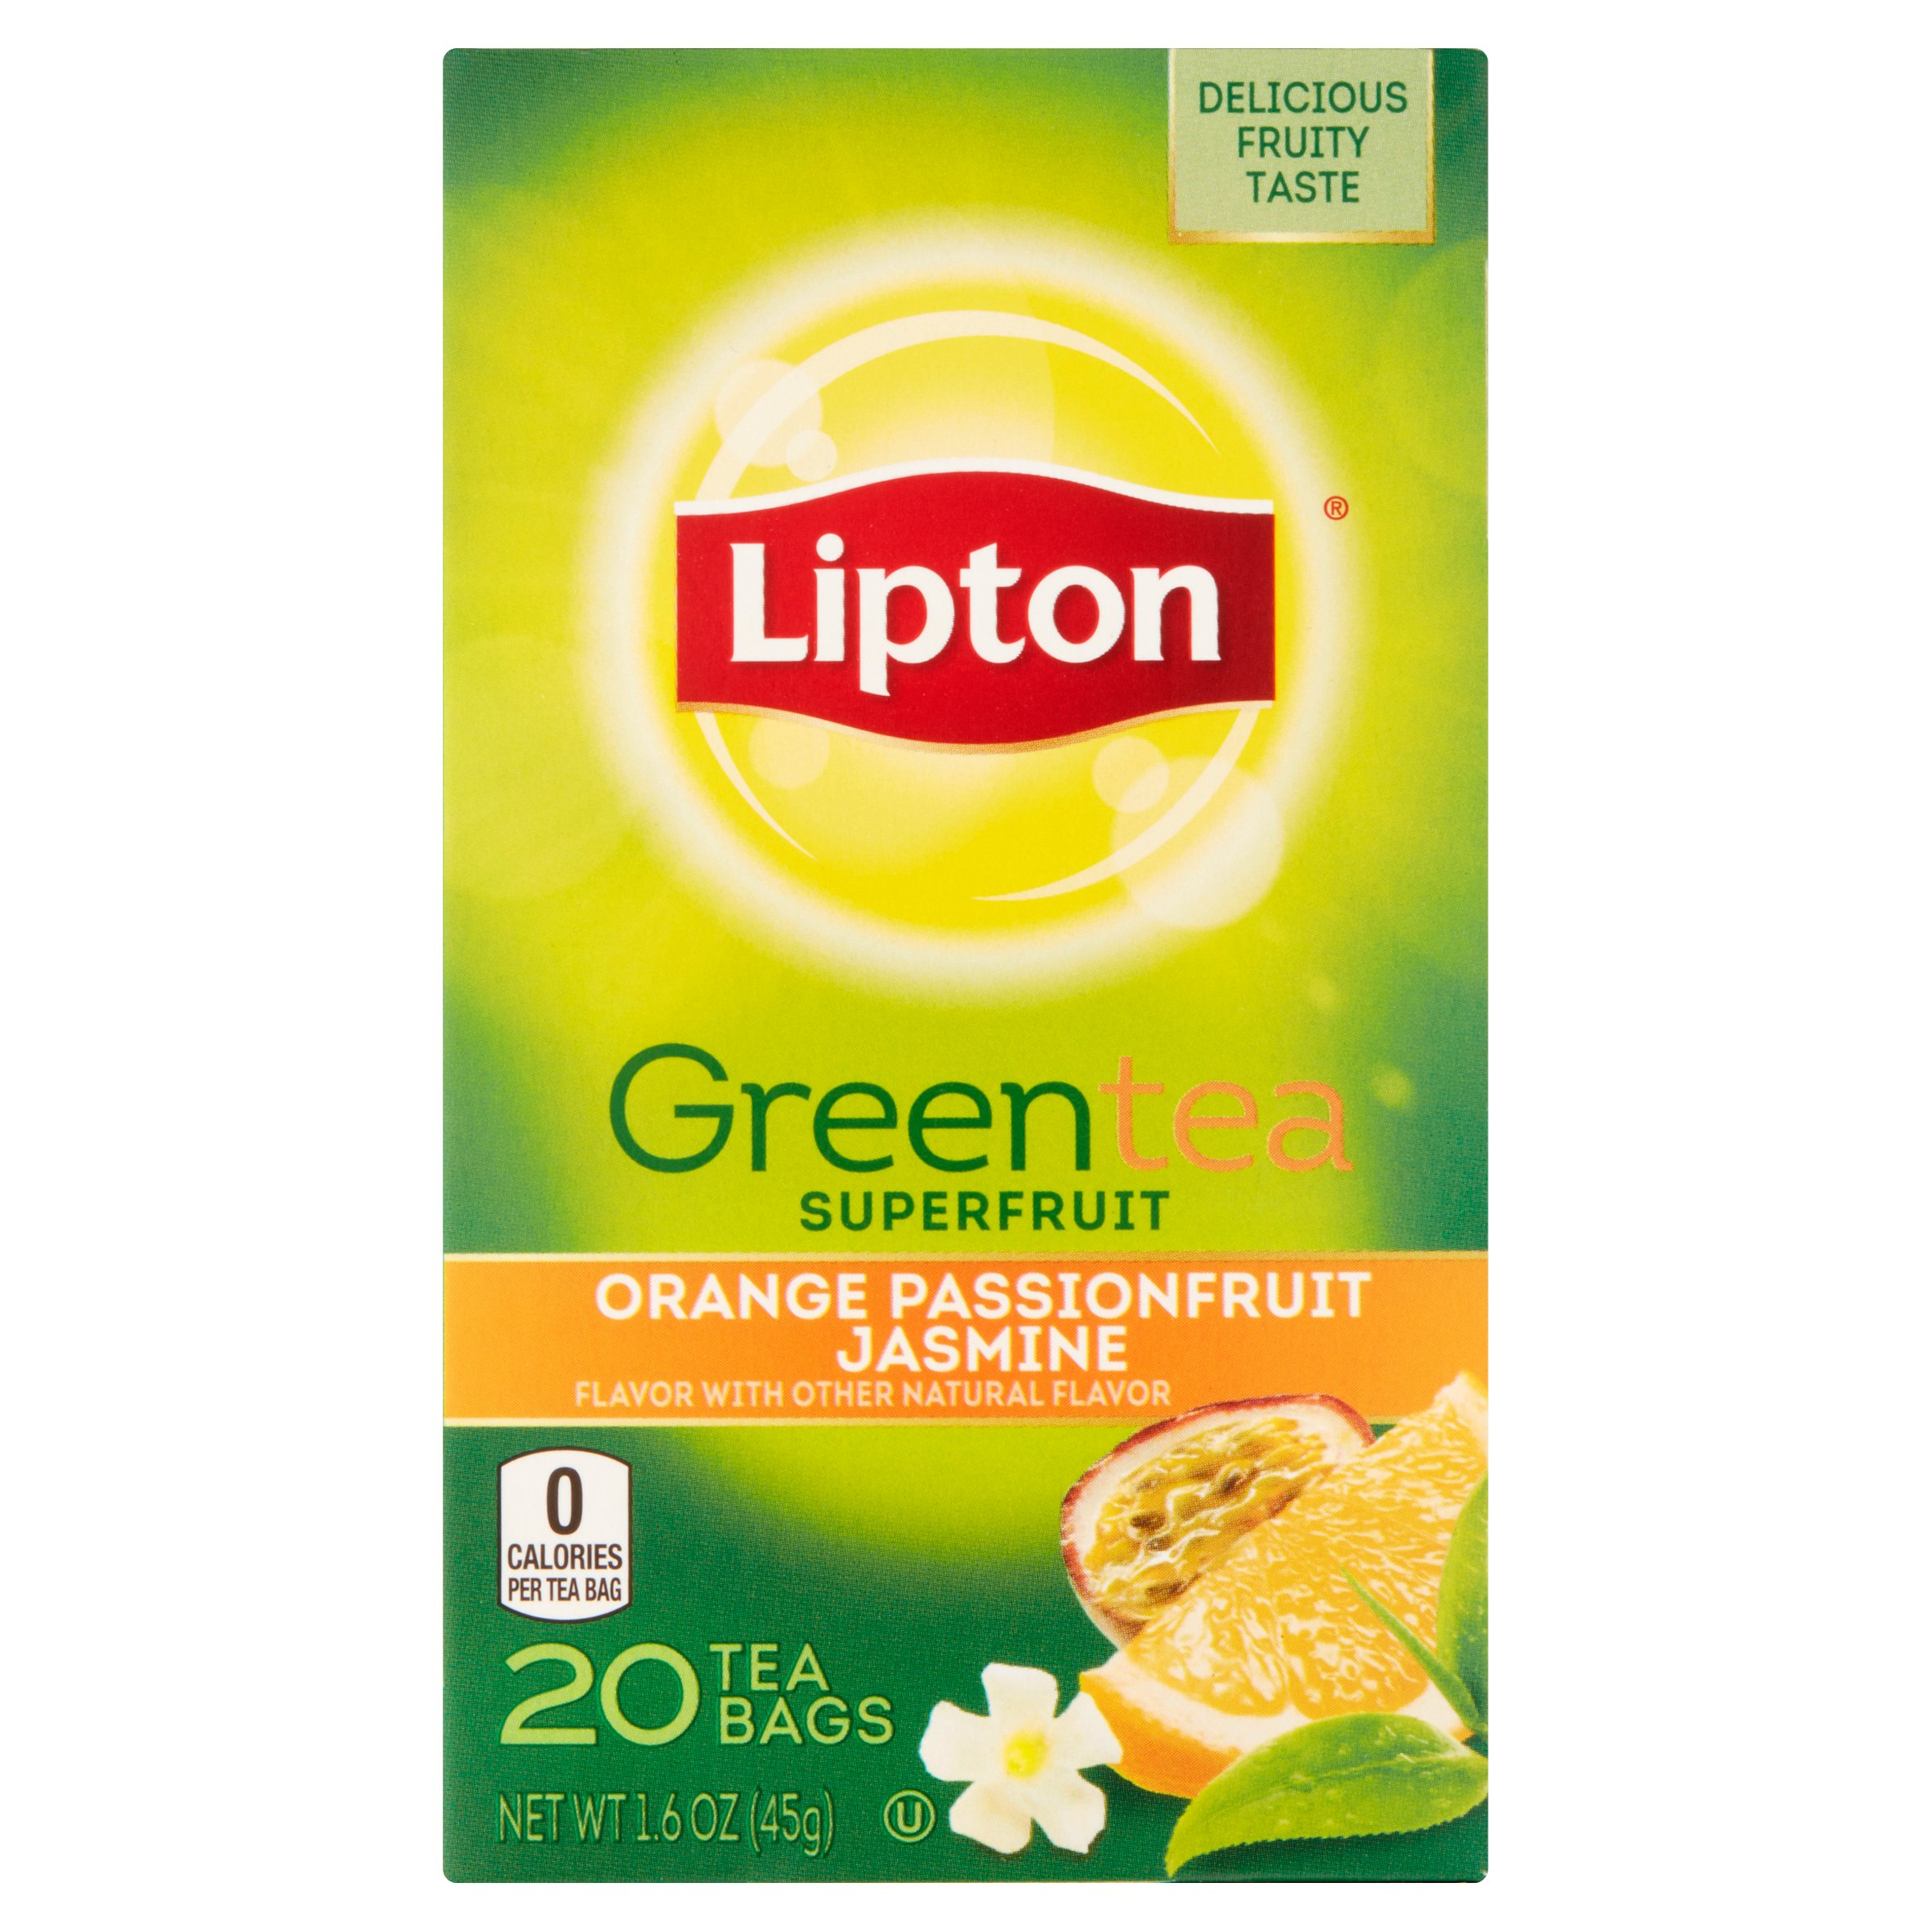 (4 Boxes) Lipton Green Tea Bags Orange Passionfruit Jasmine 20 ct